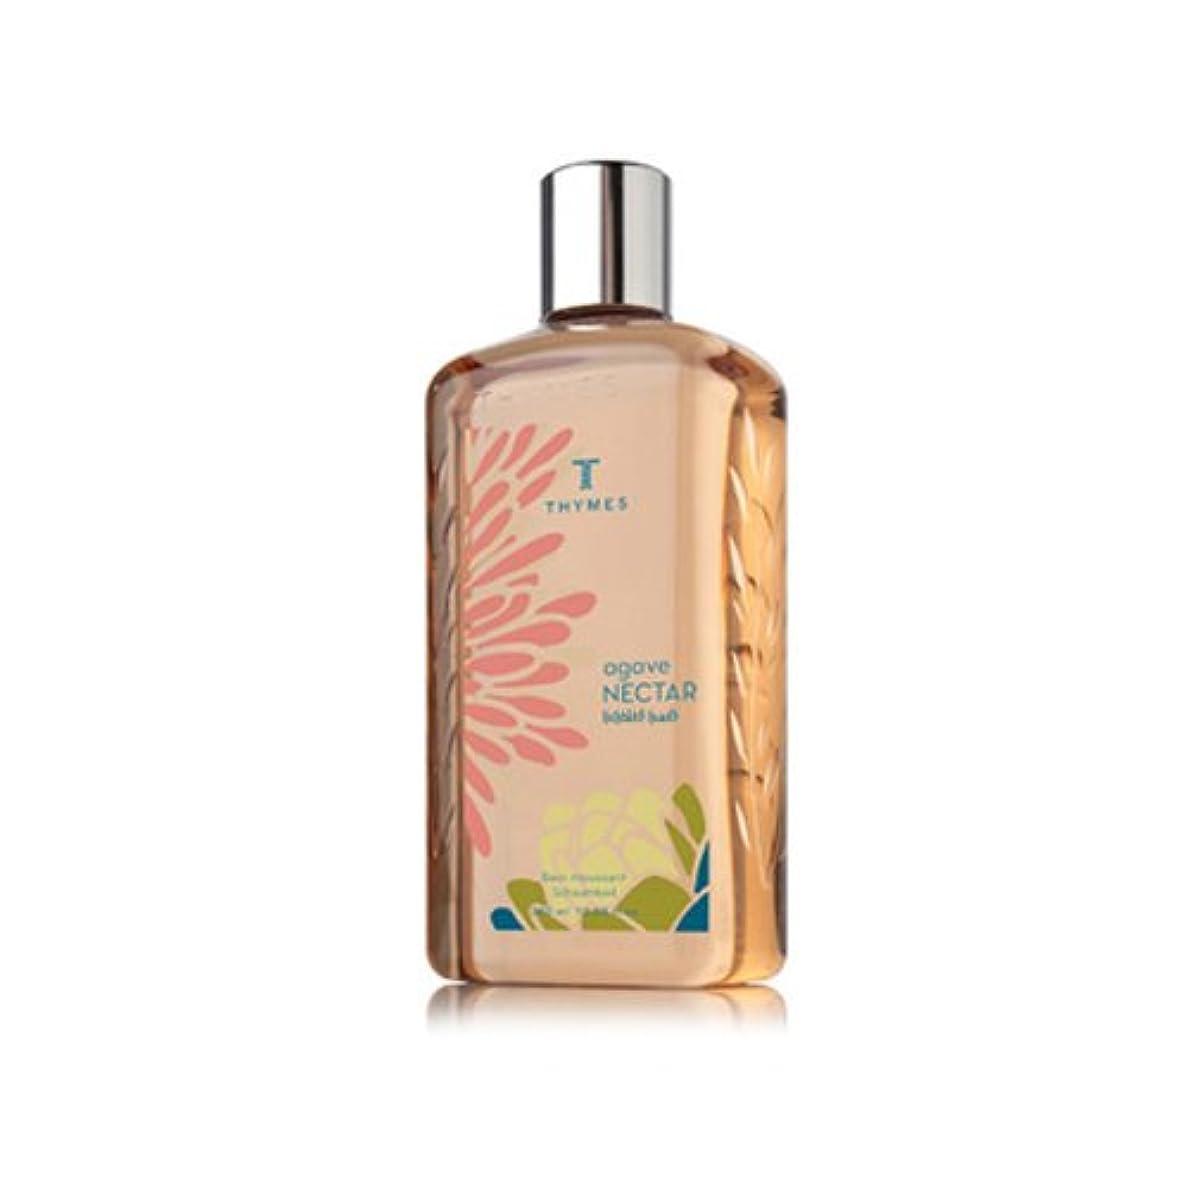 THYMES タイムズ バブルバス 360ml アガベネクター Bubble Bath 12.25 fl oz Agave Nectar [並行輸入品]